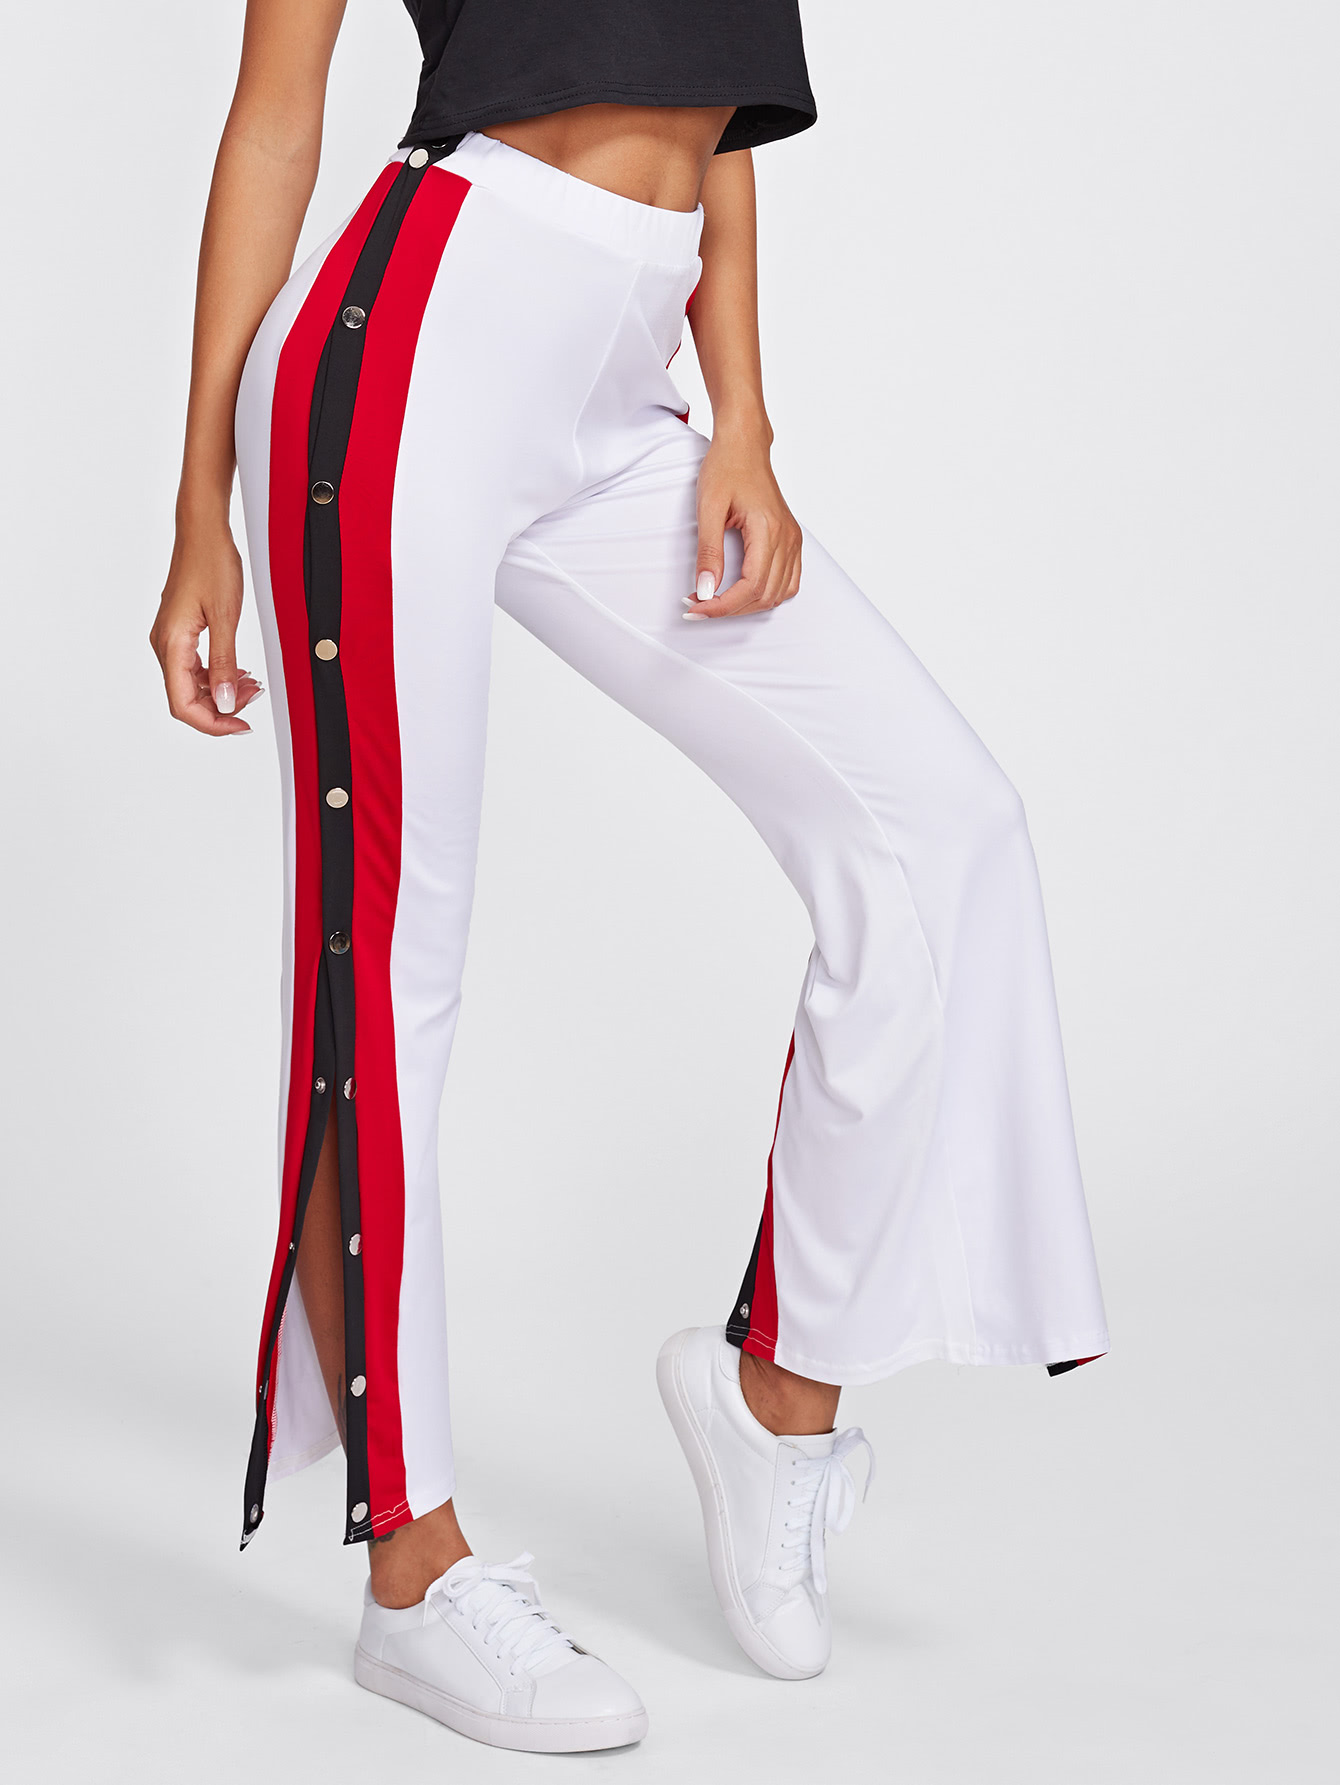 5715dfd12e Side Striped Button Embellished Split Pants -SheIn(Sheinside)